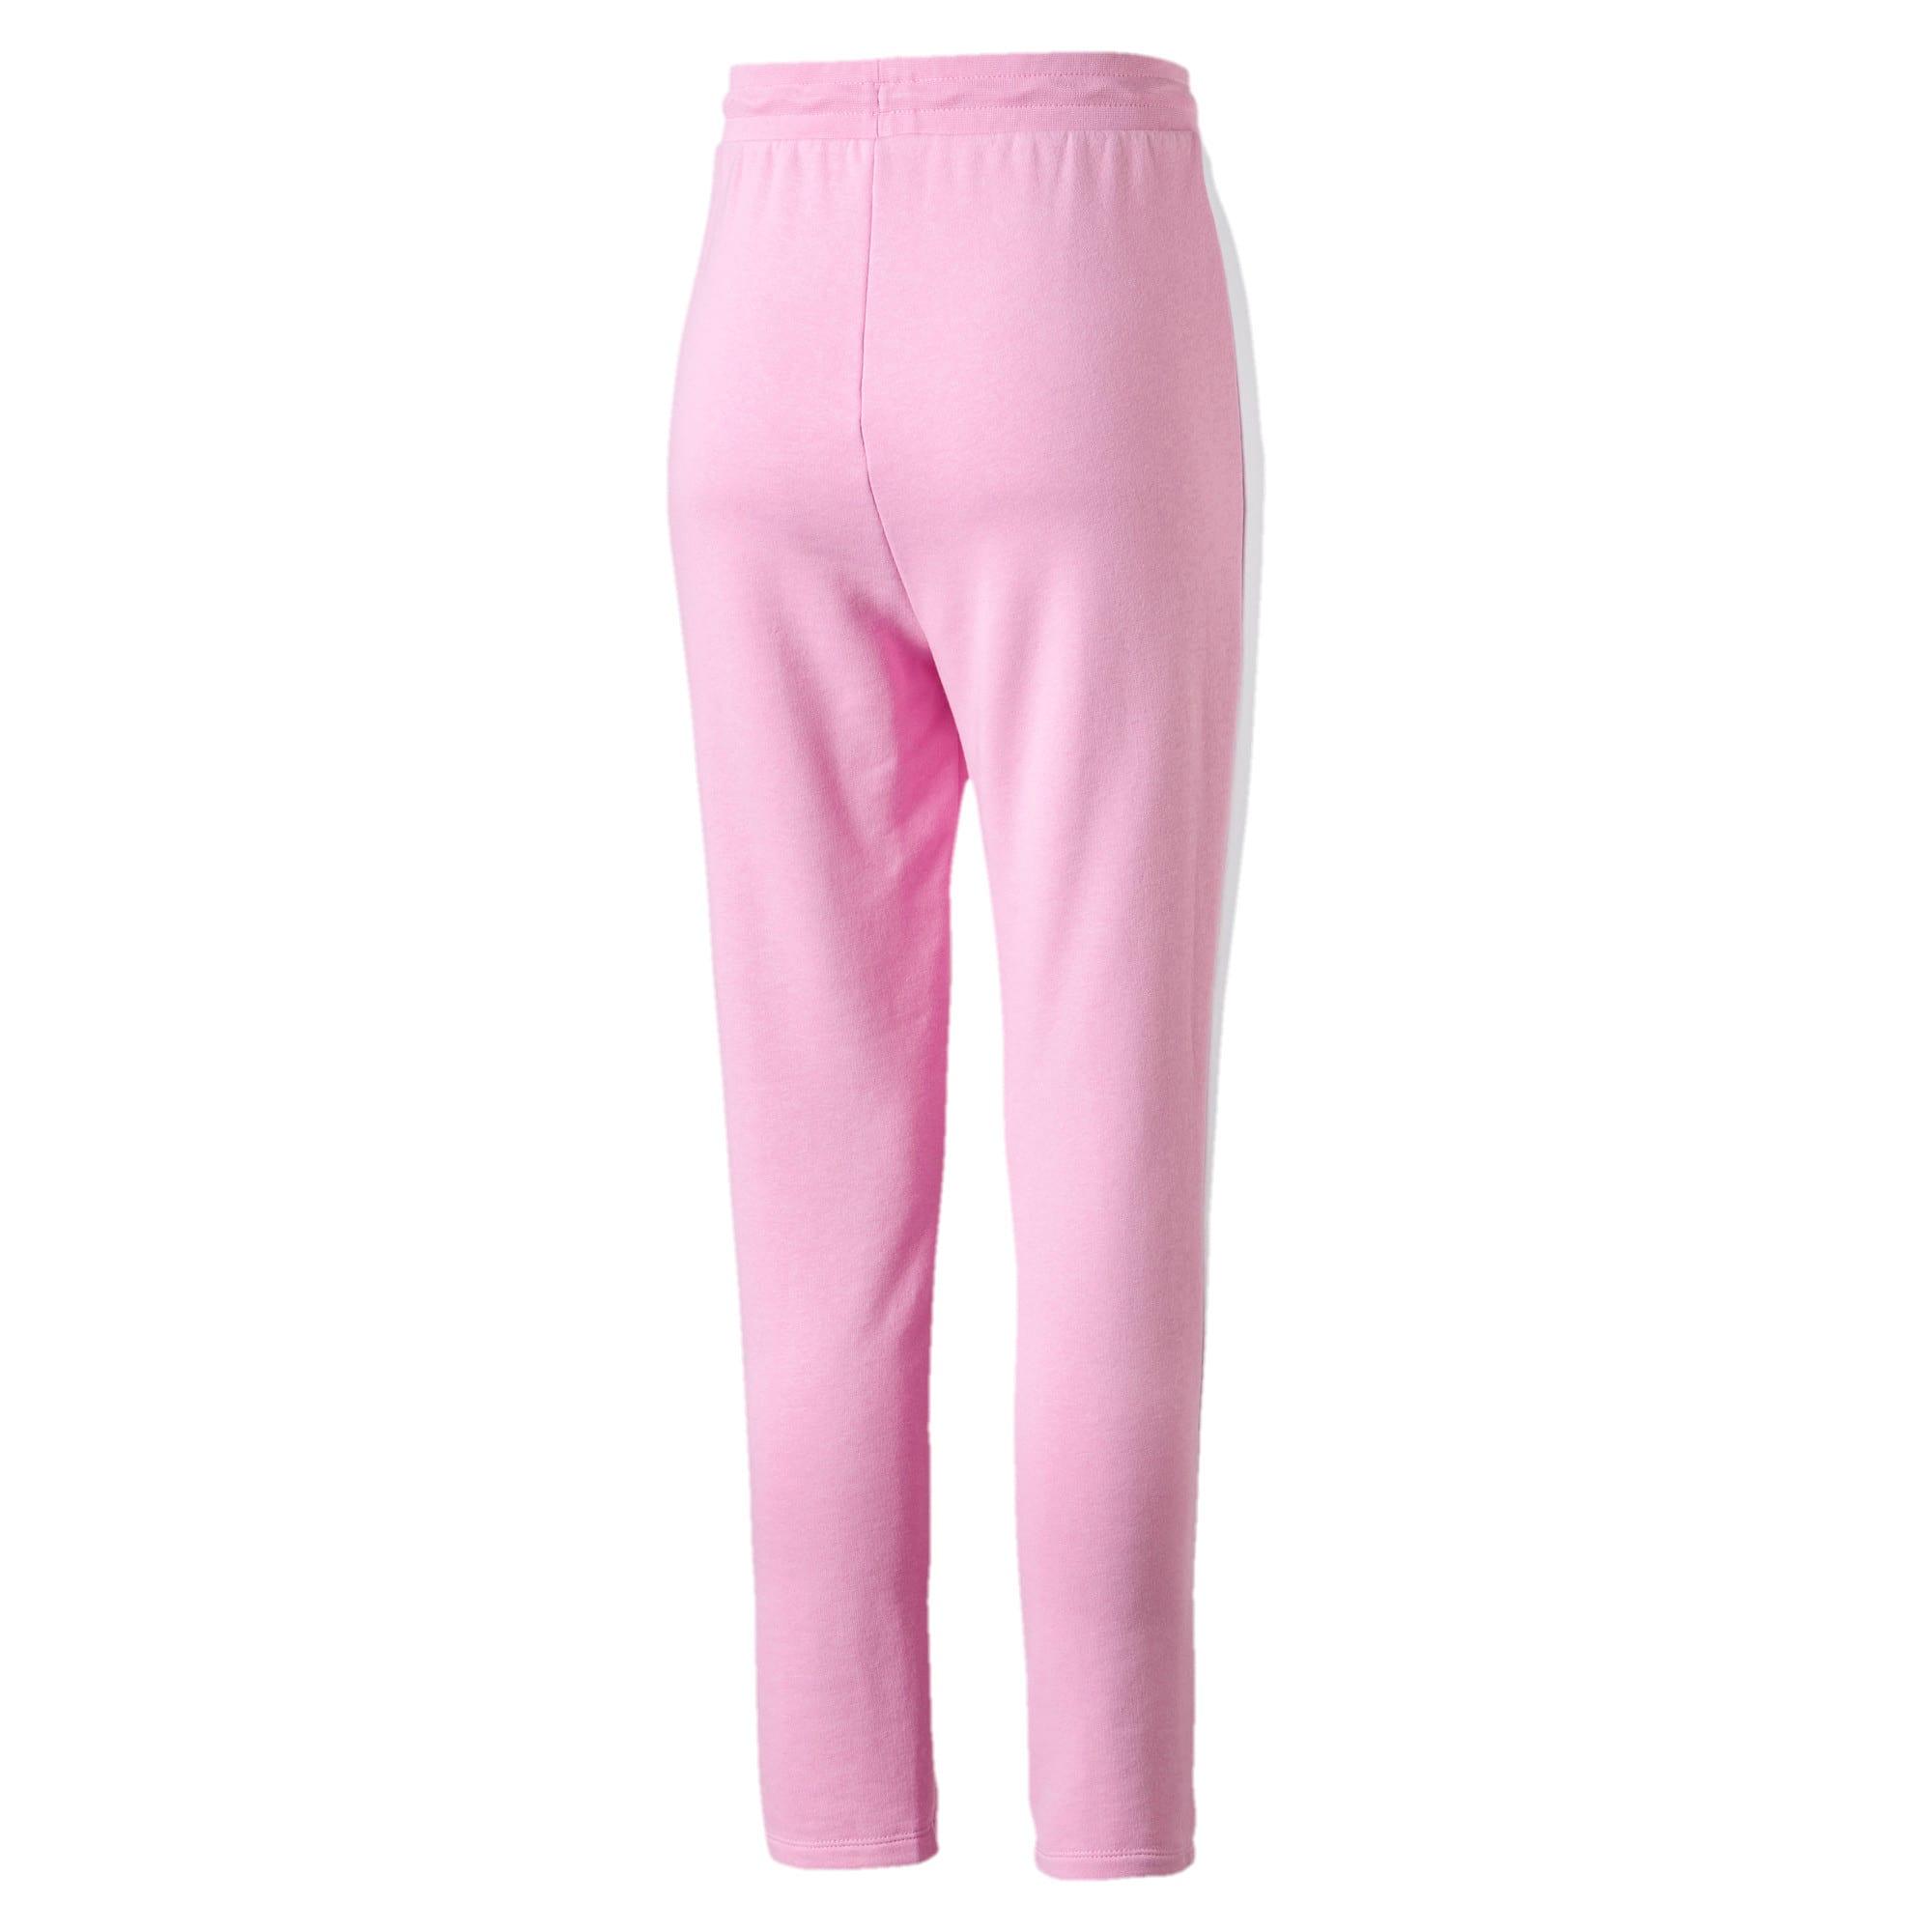 Thumbnail 4 of Classics T7 Women's Track Pants, Pale Pink, medium-IND